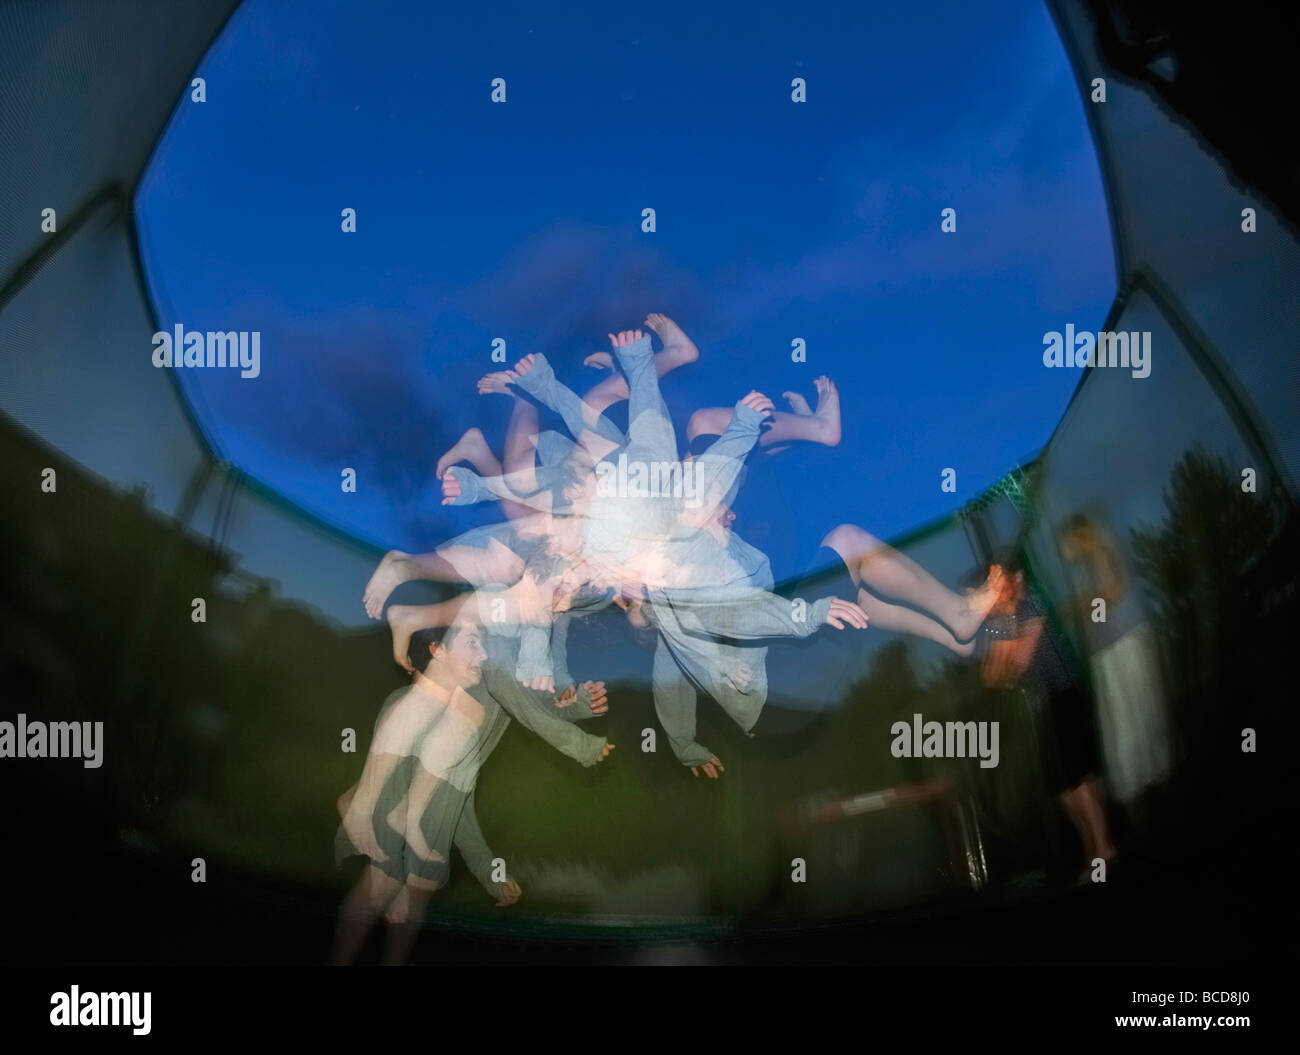 Trampoline Jumping Stock Photo